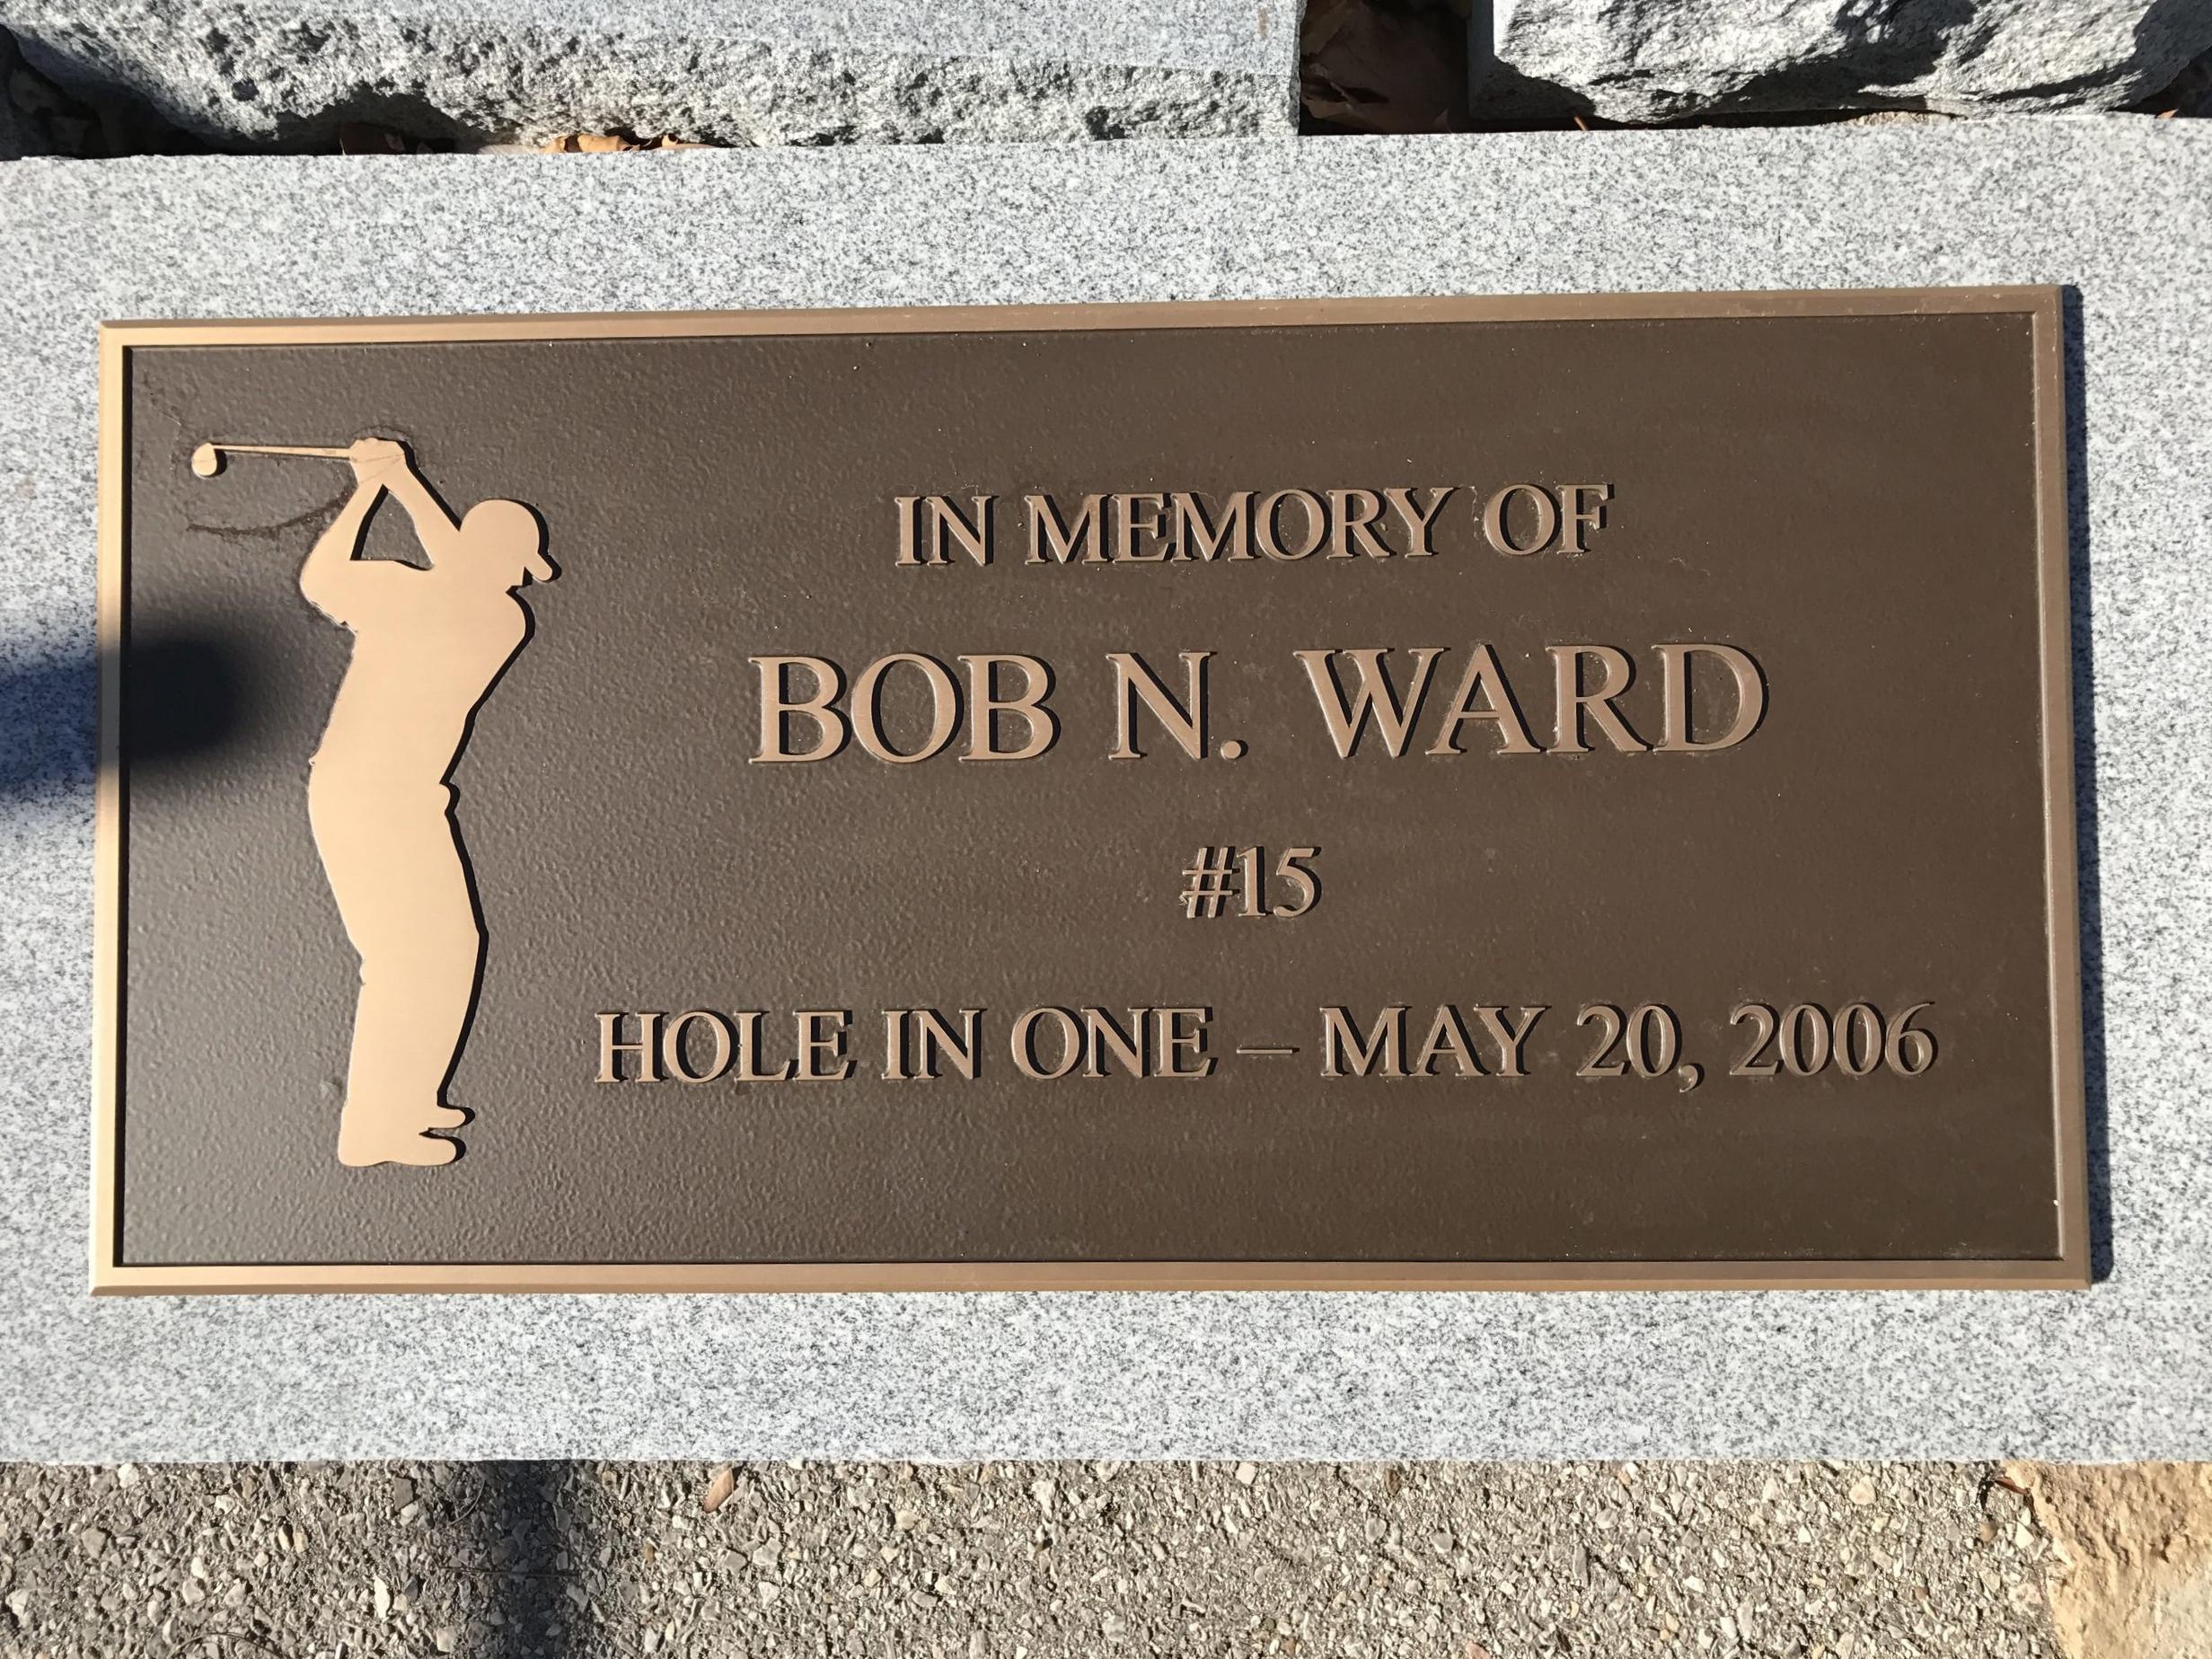 9. Rose Creek Golf Course